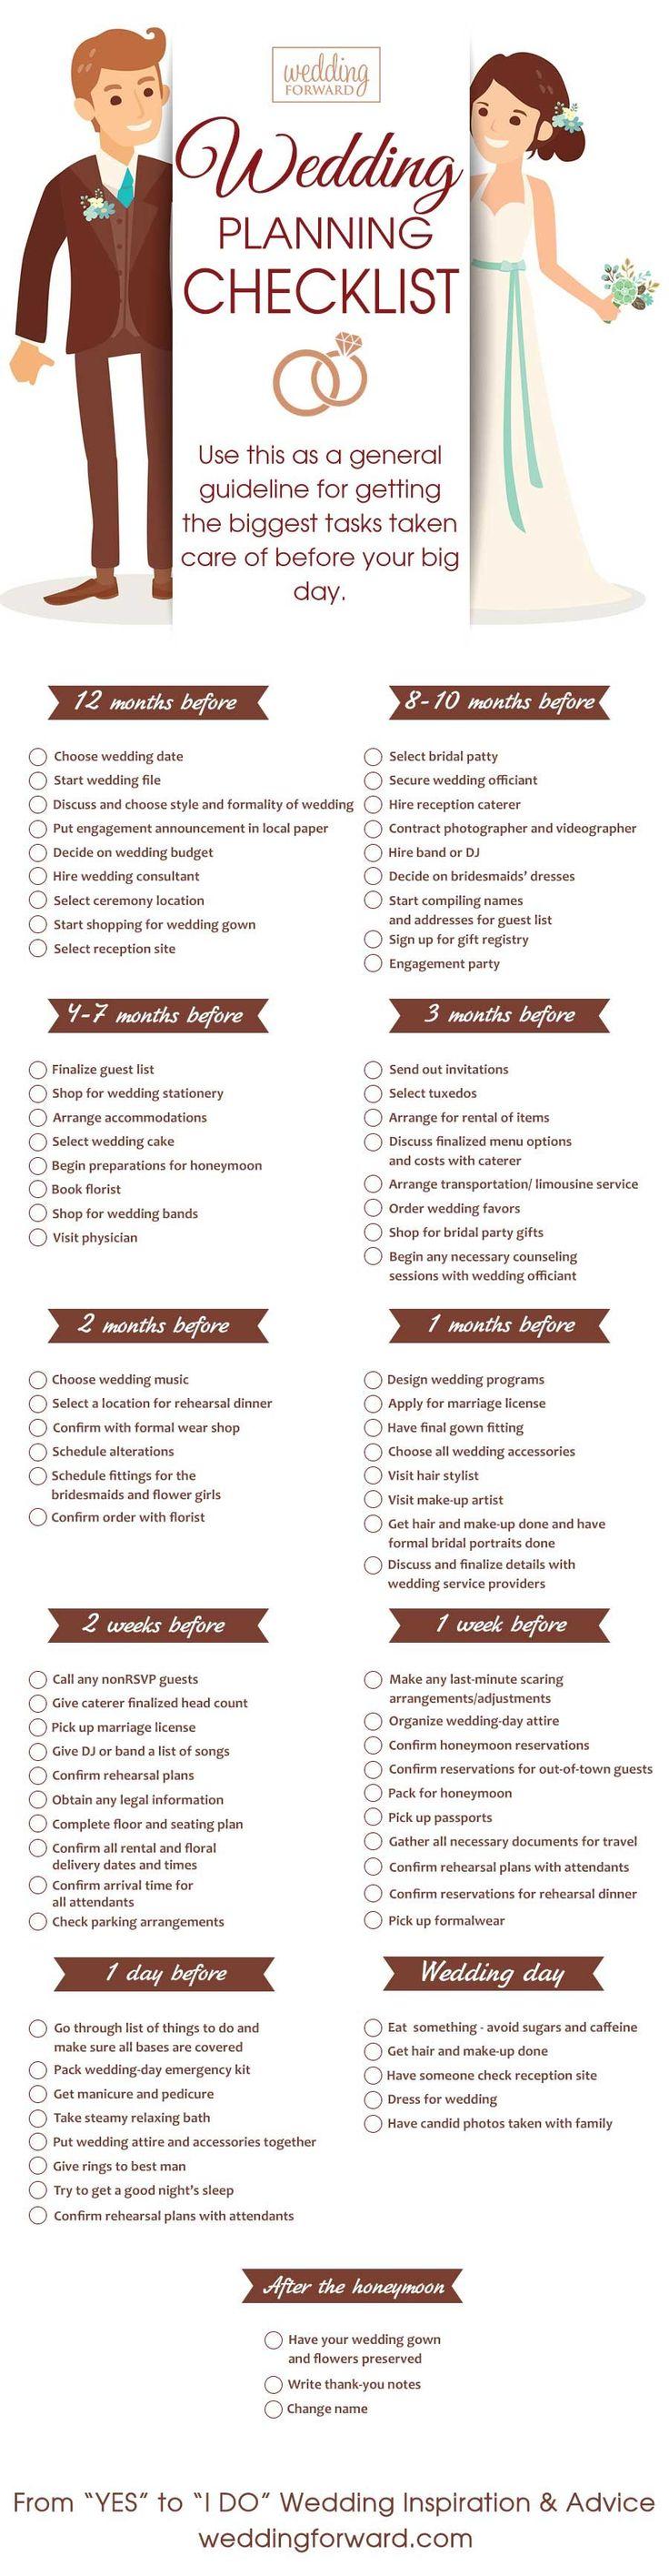 12 Month Wedding Planning Timeline